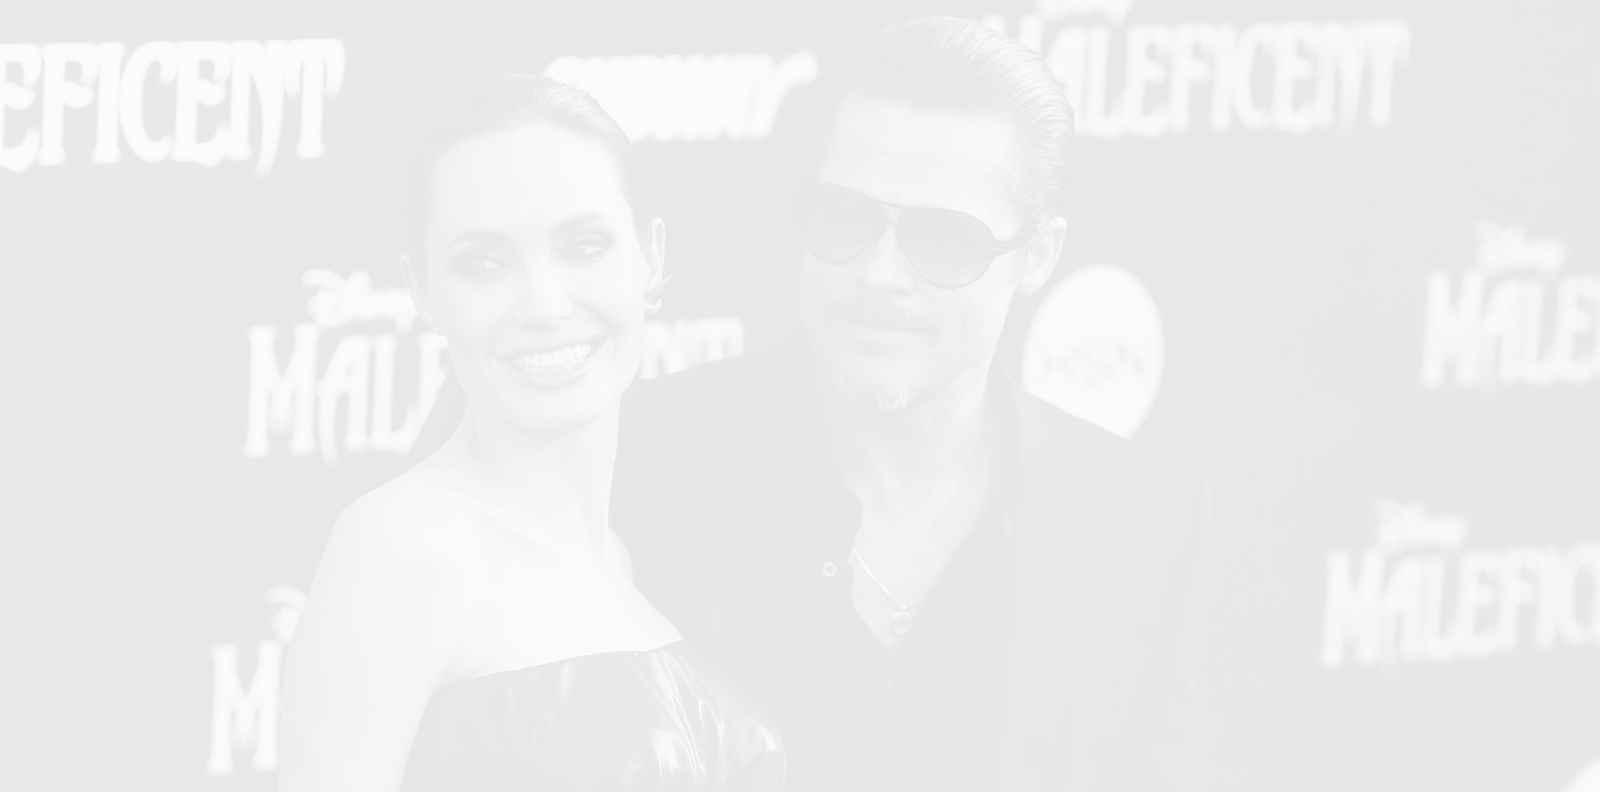 Нови детайли около развода на Брад Пит и Анджелина Джоли